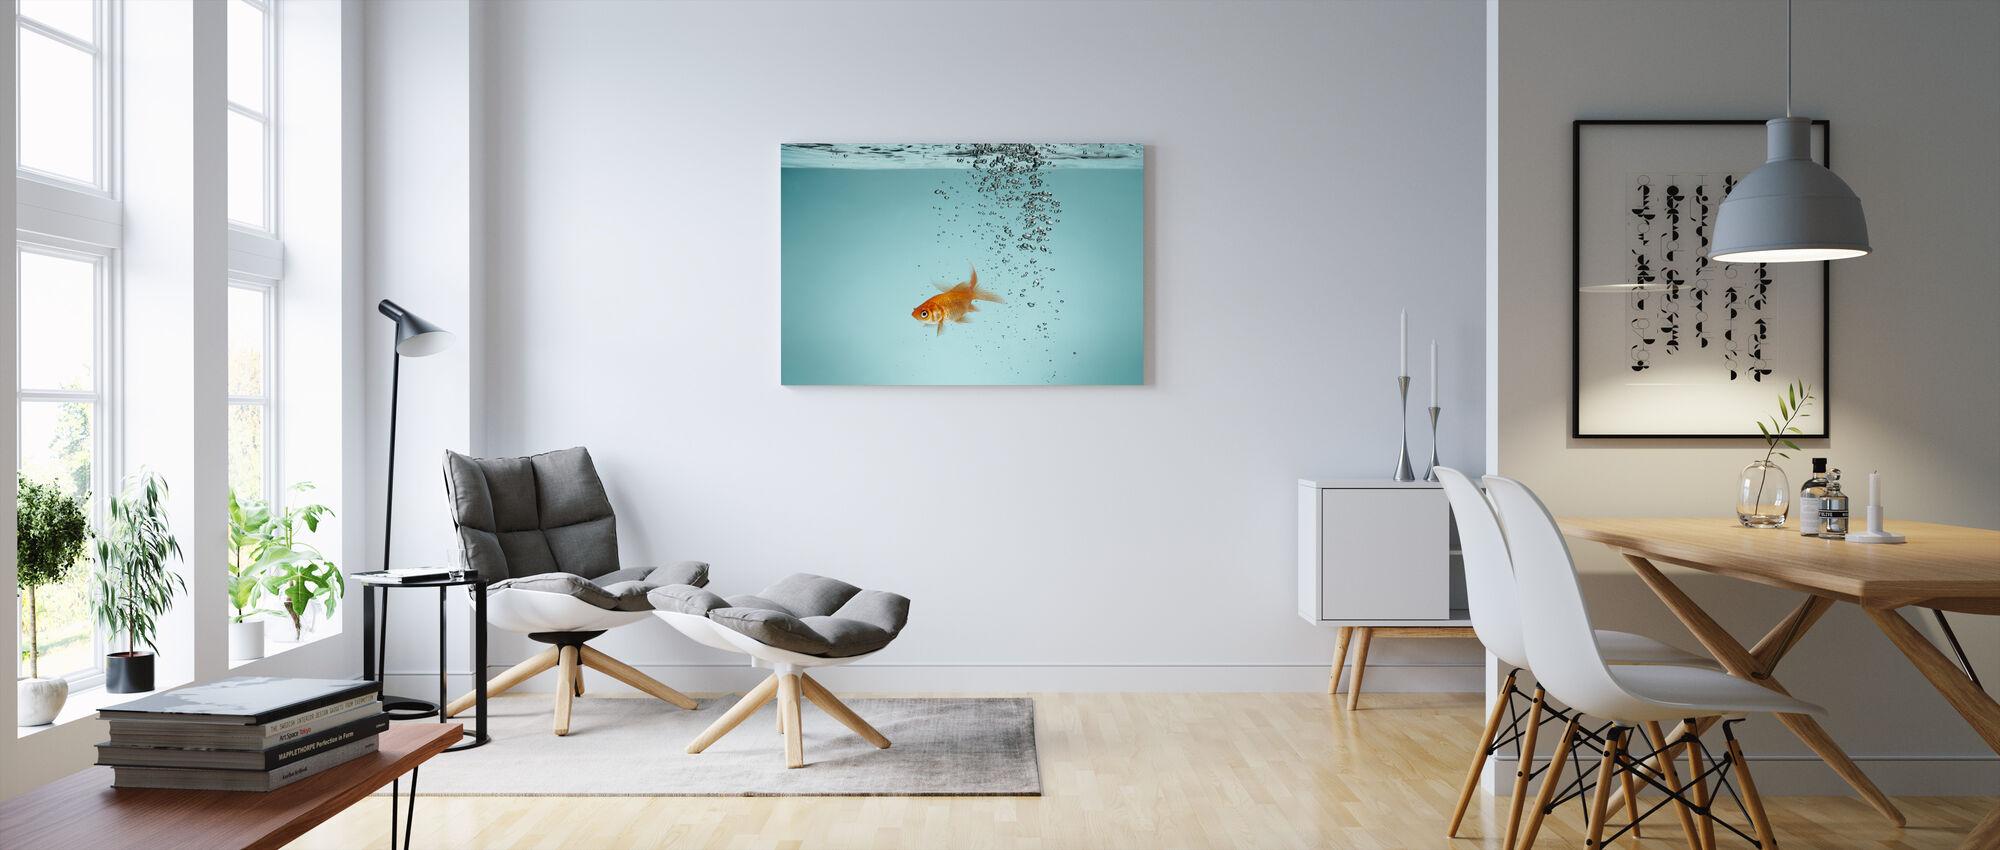 Ensamma Guldfisk - Canvastavla - Vardagsrum